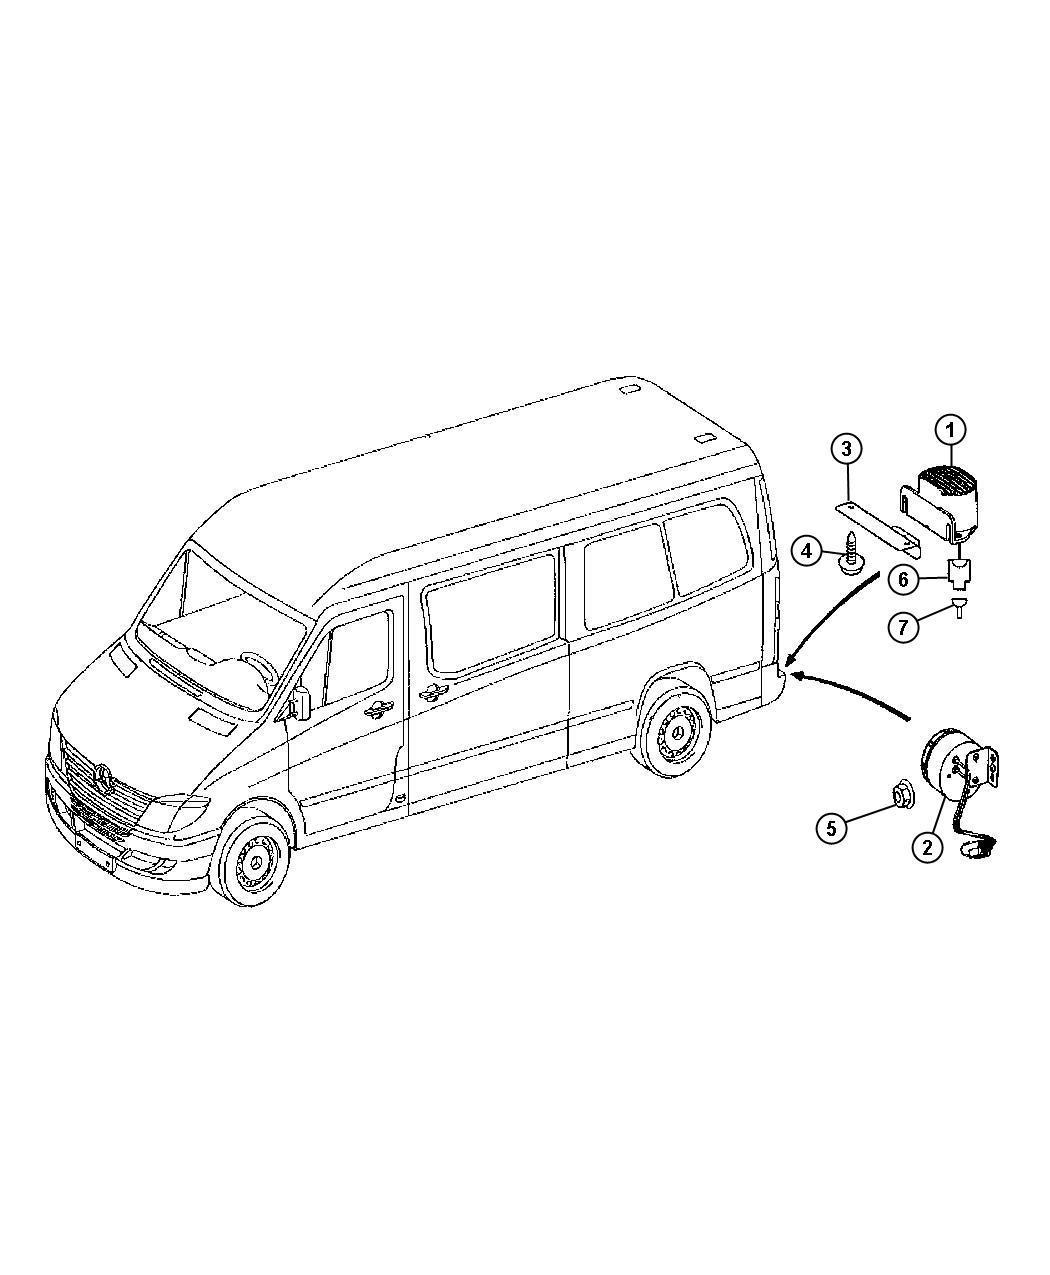 Dodge Sprinter Connector Wiring Repair